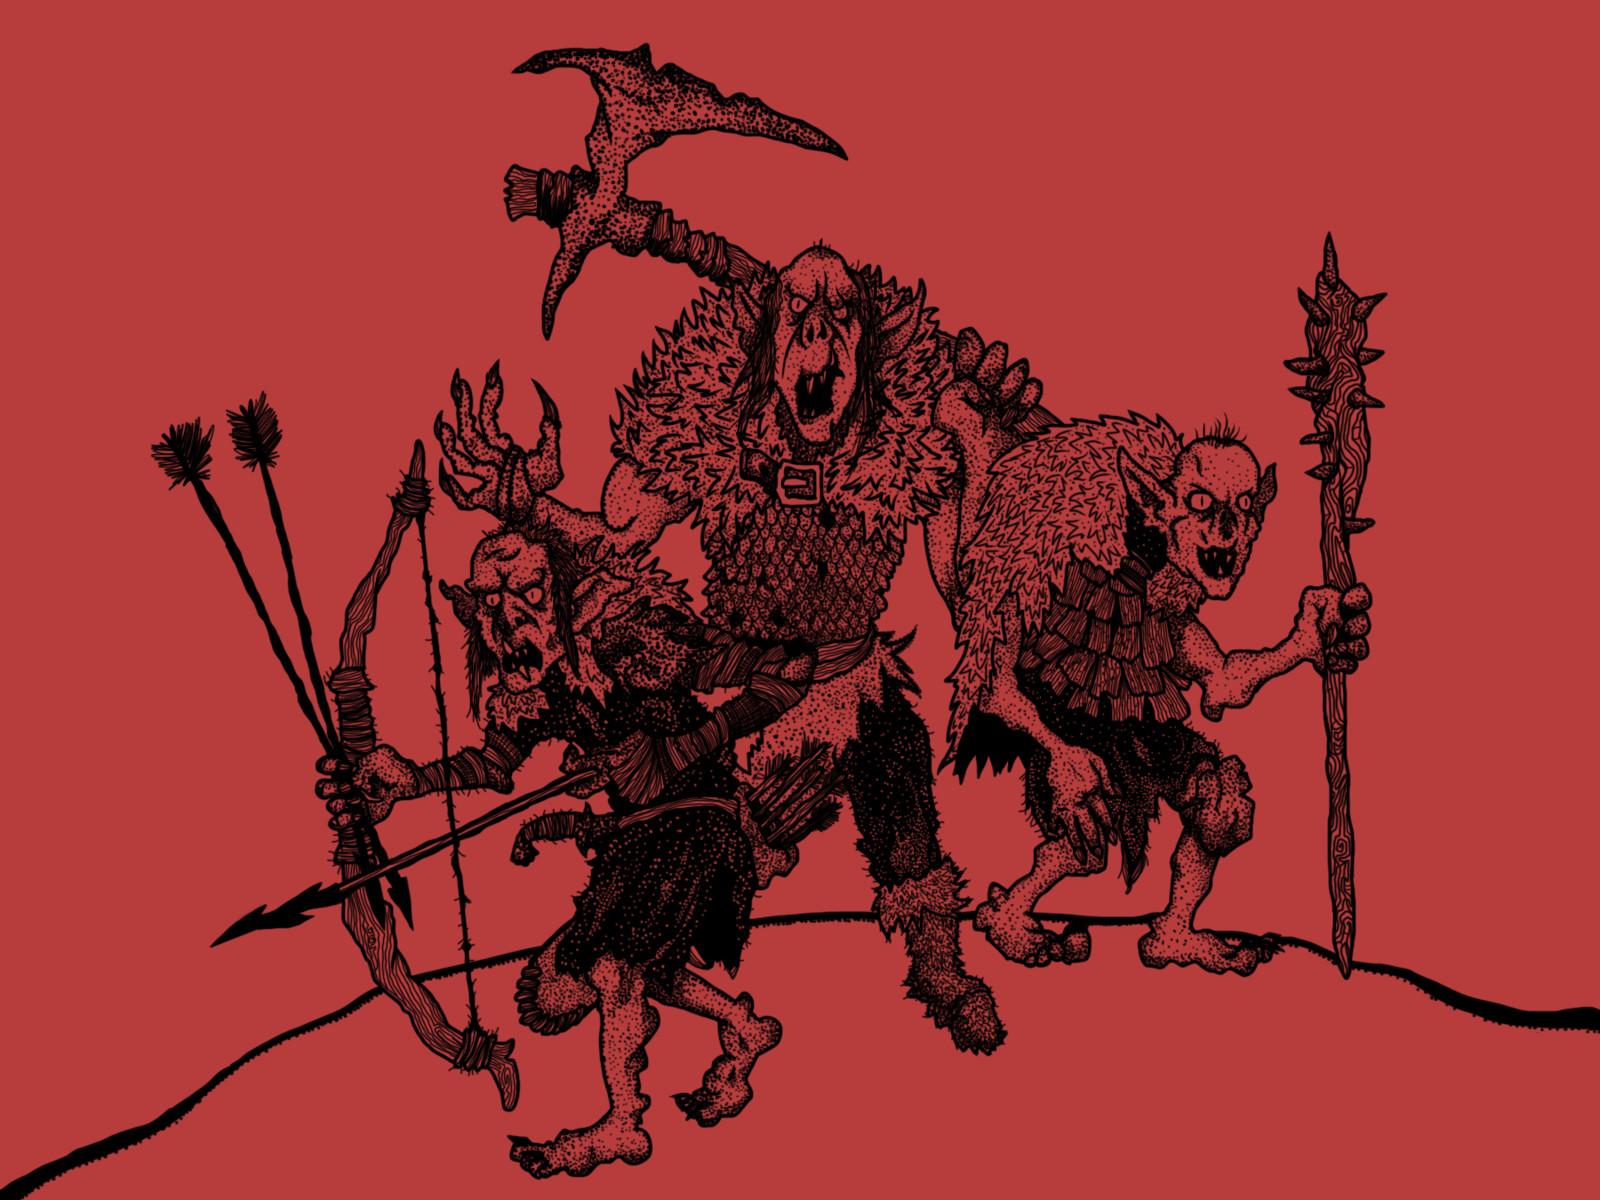 Goblinóides